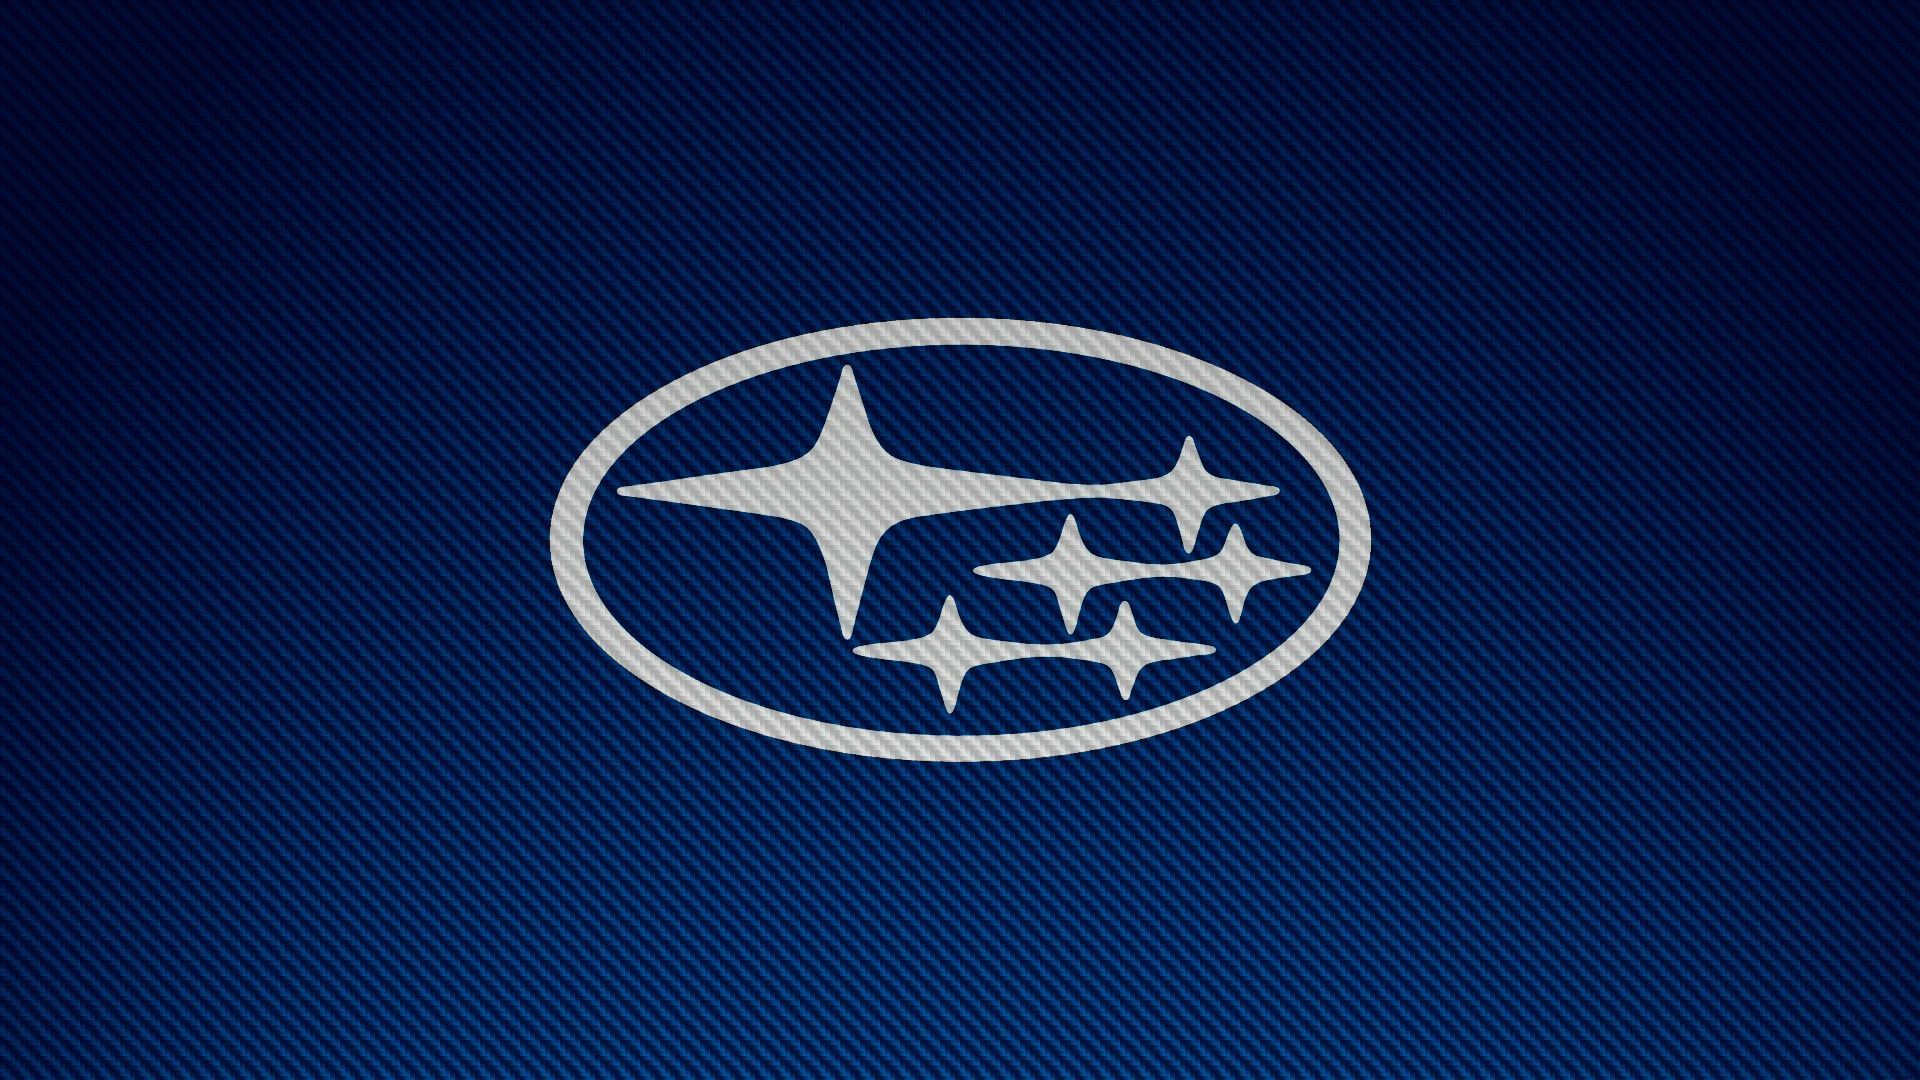 Subaru Logo Wallpapers Top Free Subaru Logo Backgrounds Wallpaperaccess